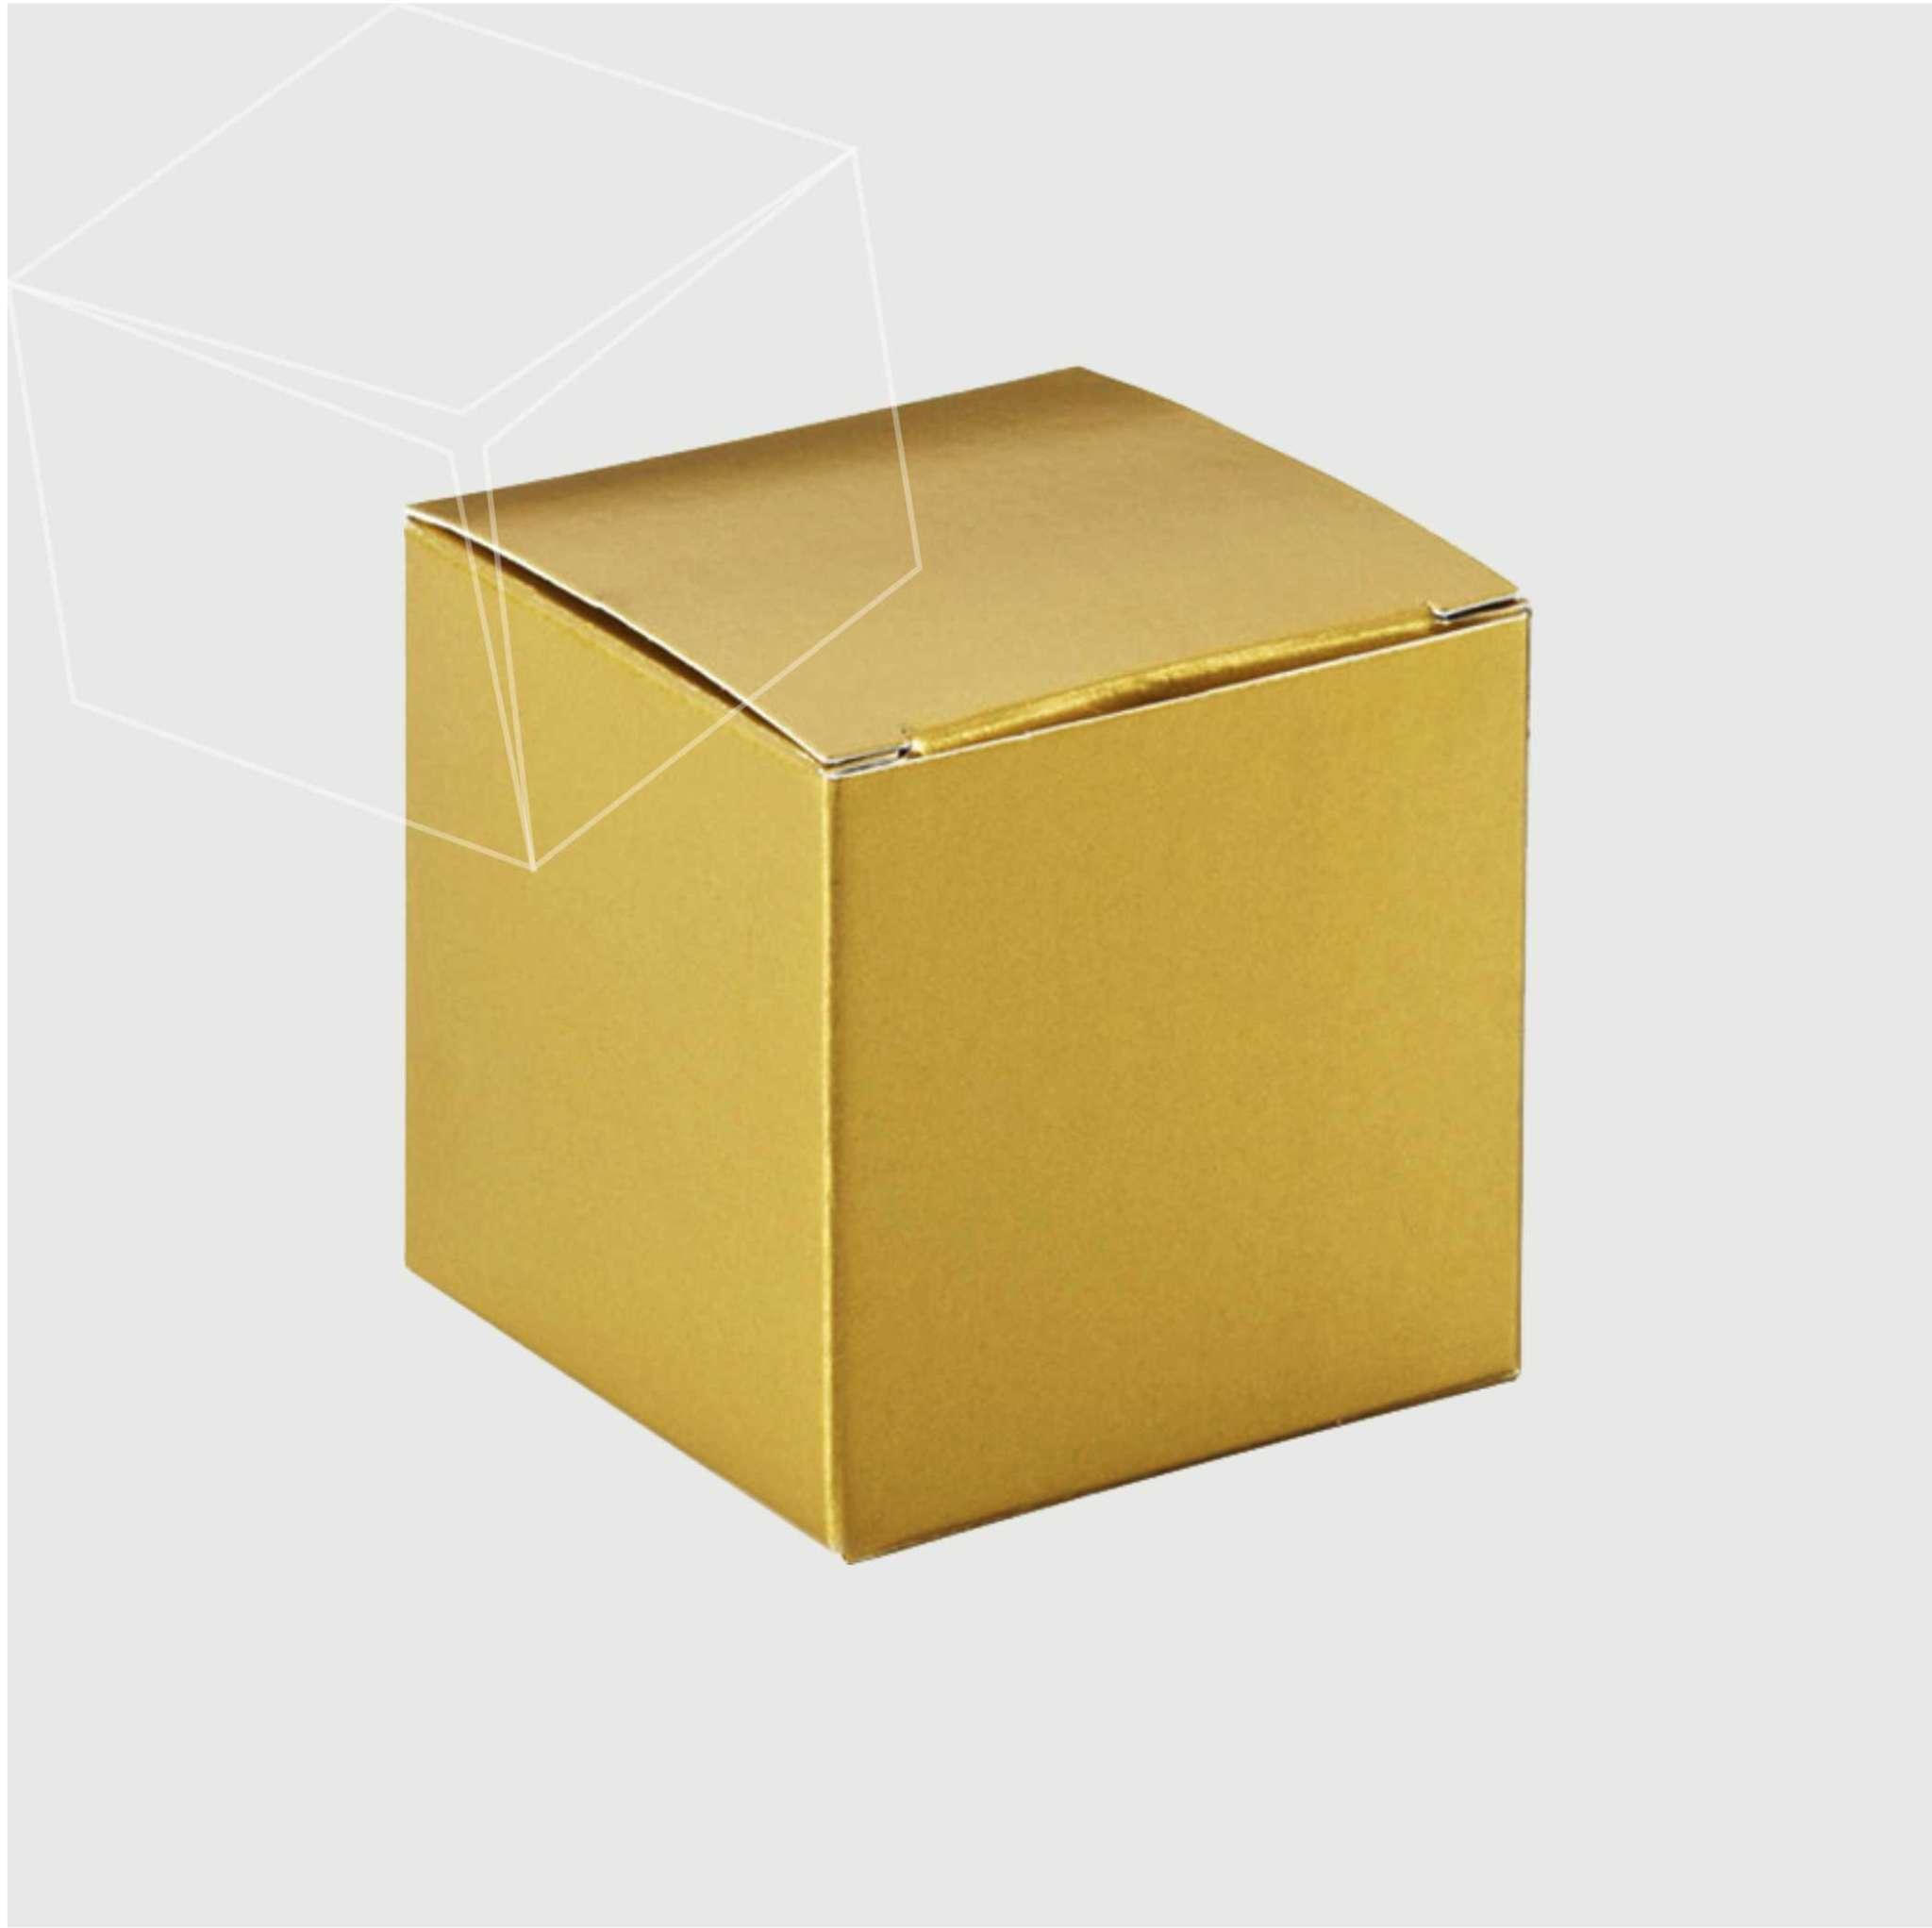 Gold Foil Box